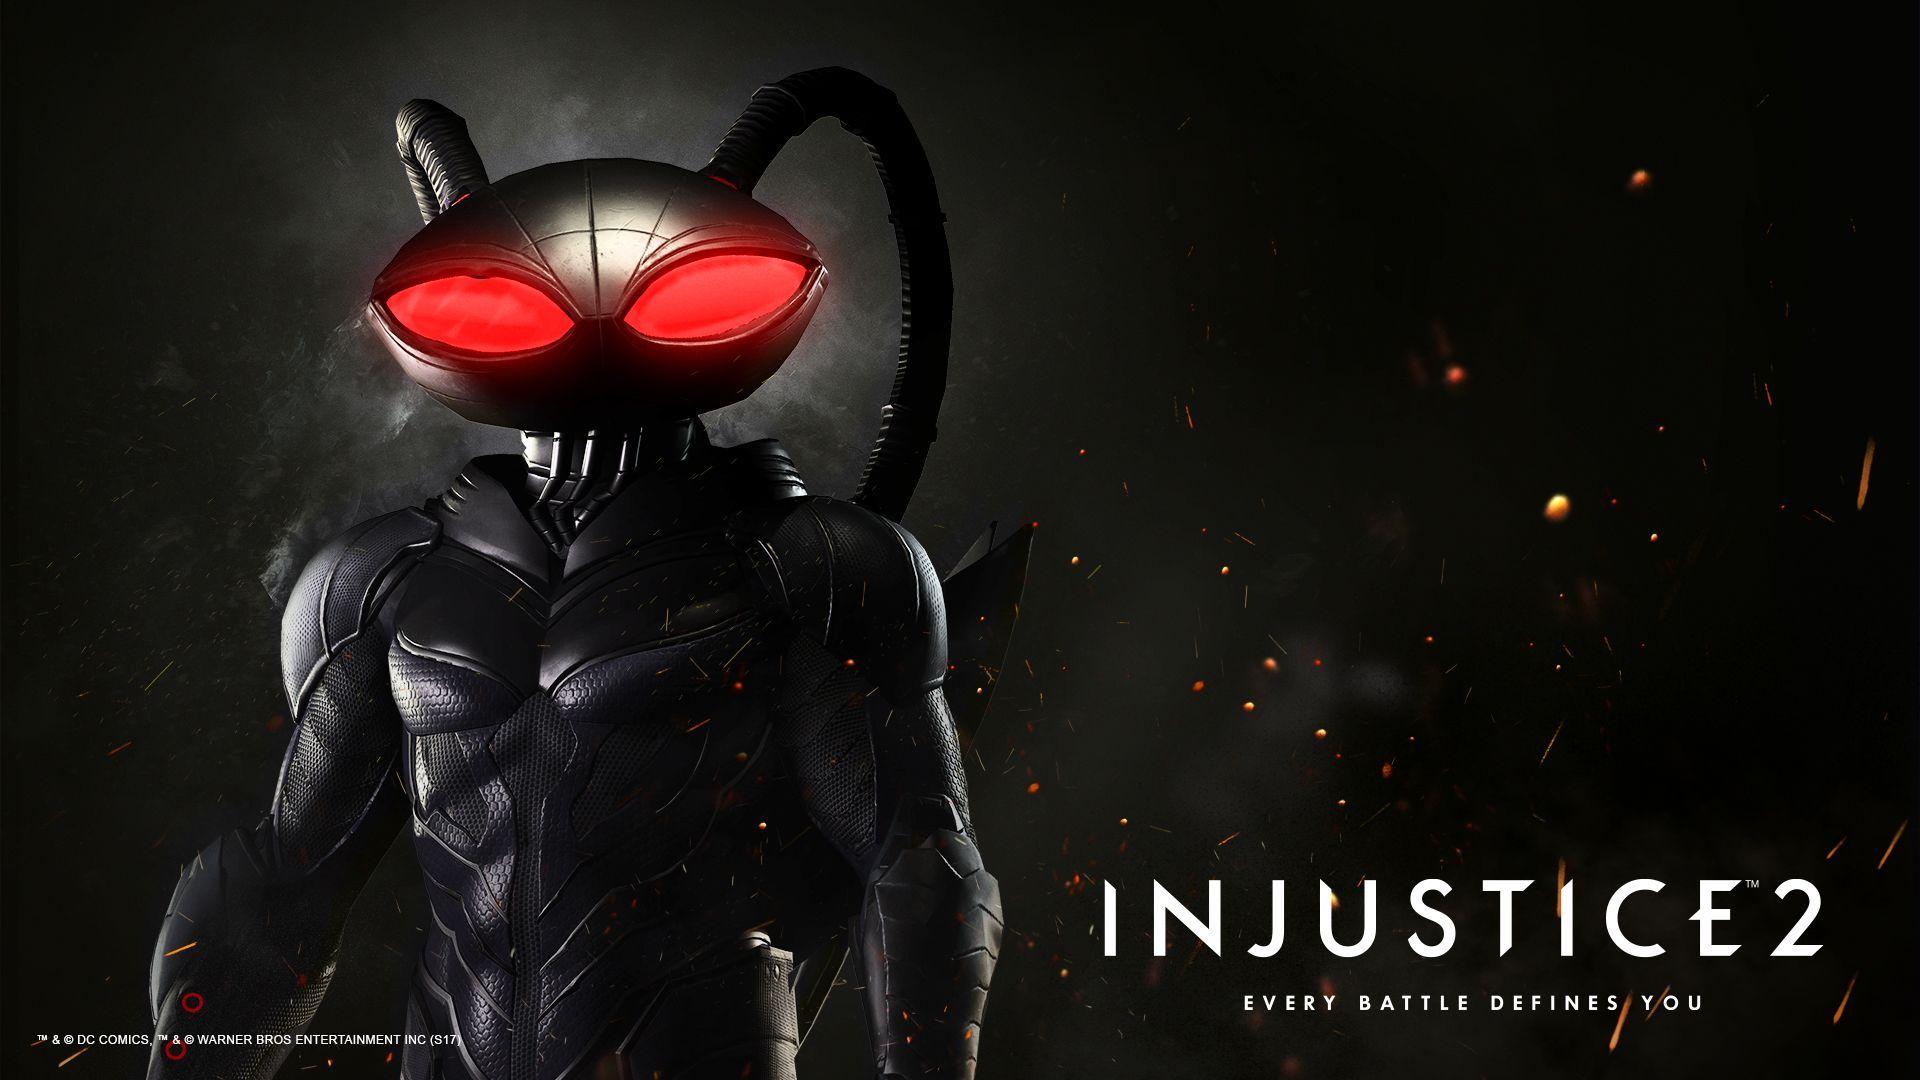 Injustice2 Blackmanta Wallpaper 1920x1080 84 Jpg 1920 1080 Black Manta Injustice 2 Batman Red Hood